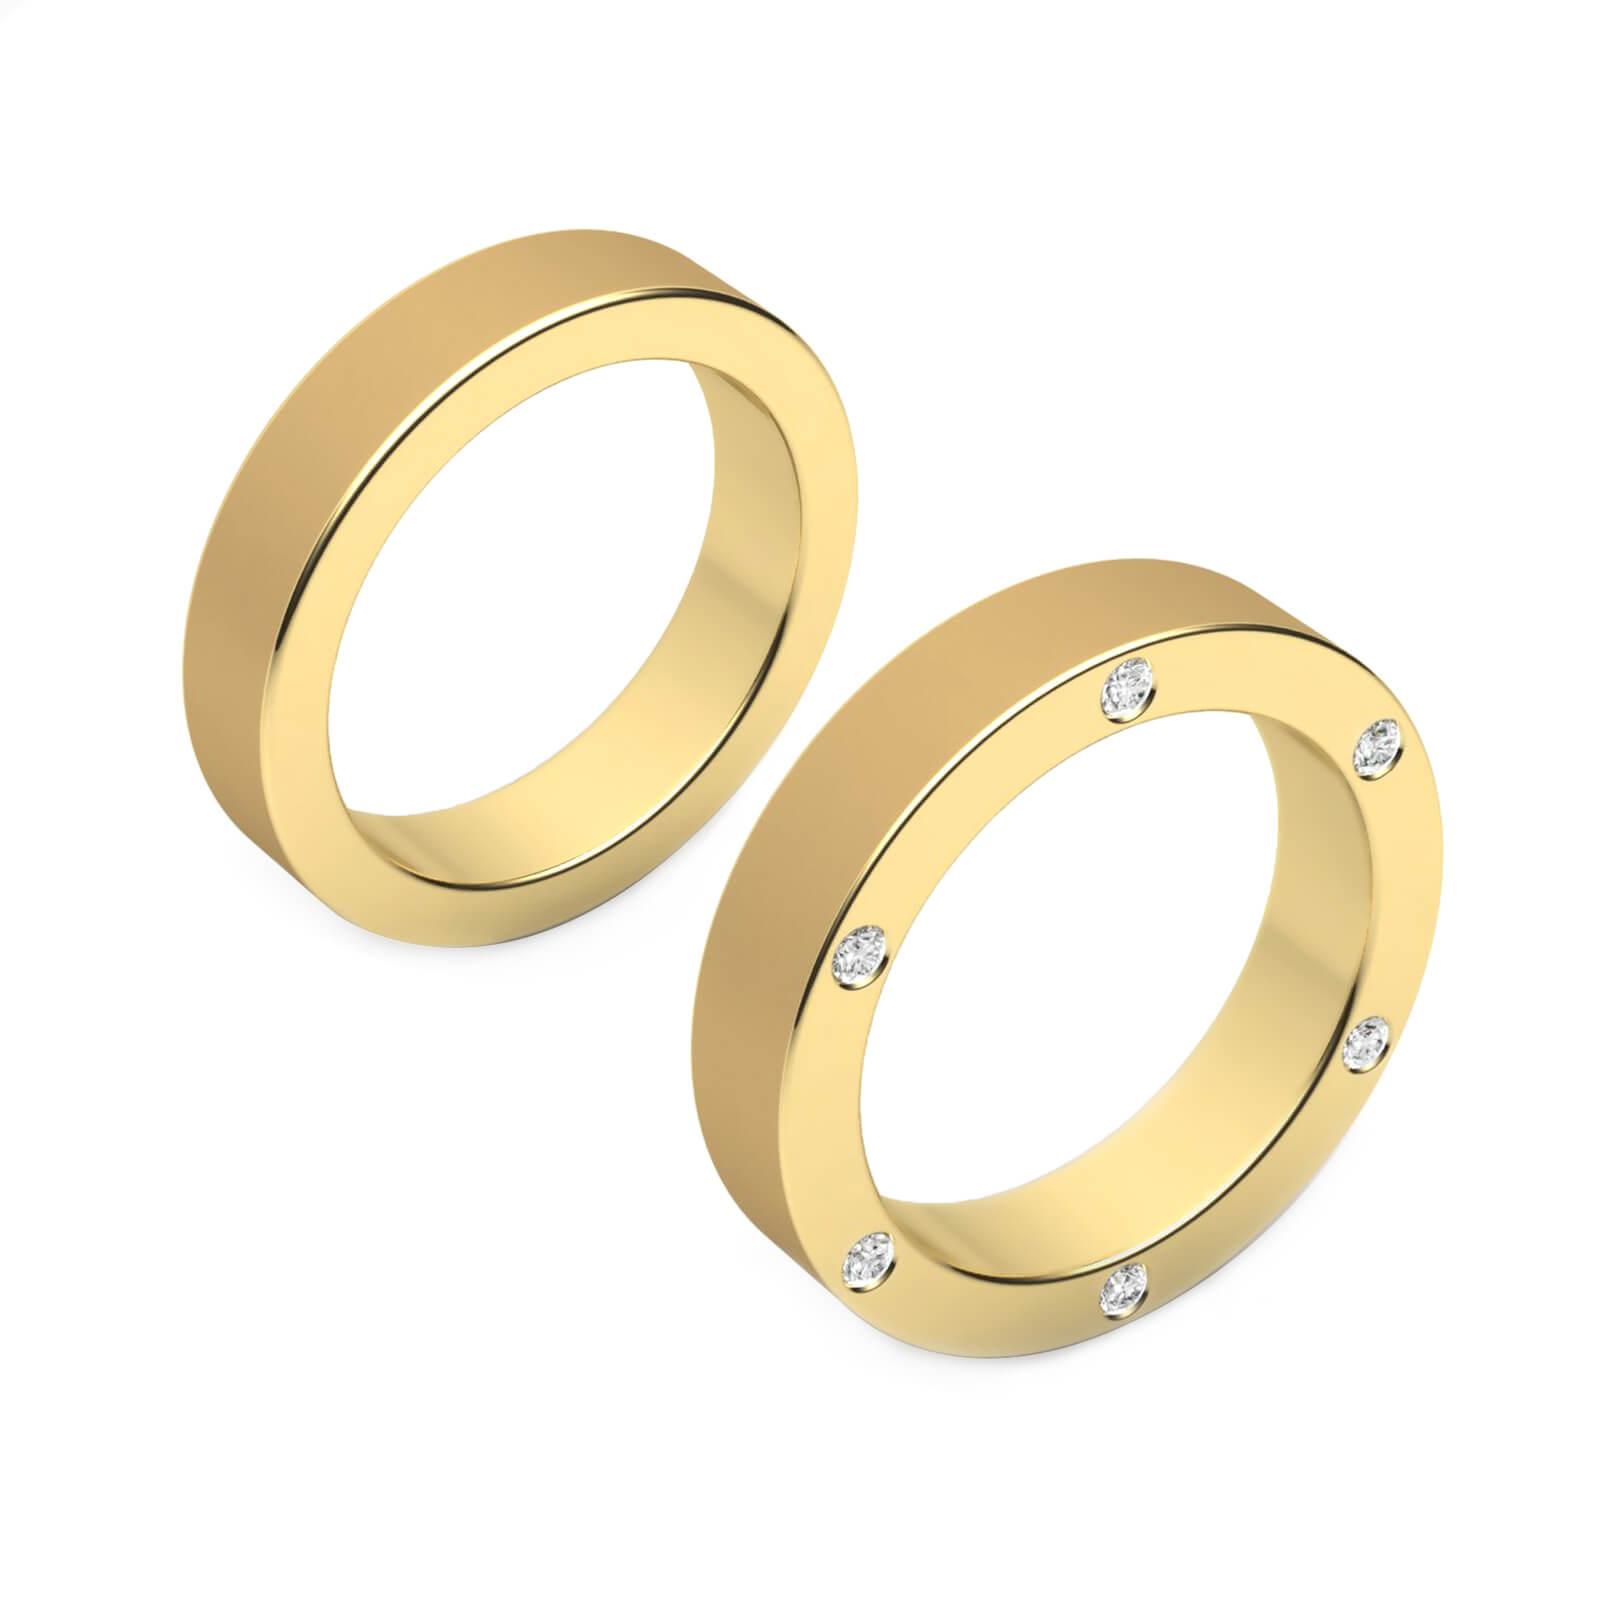 Wedding Ring 18k yellow gold with 6 diamonds